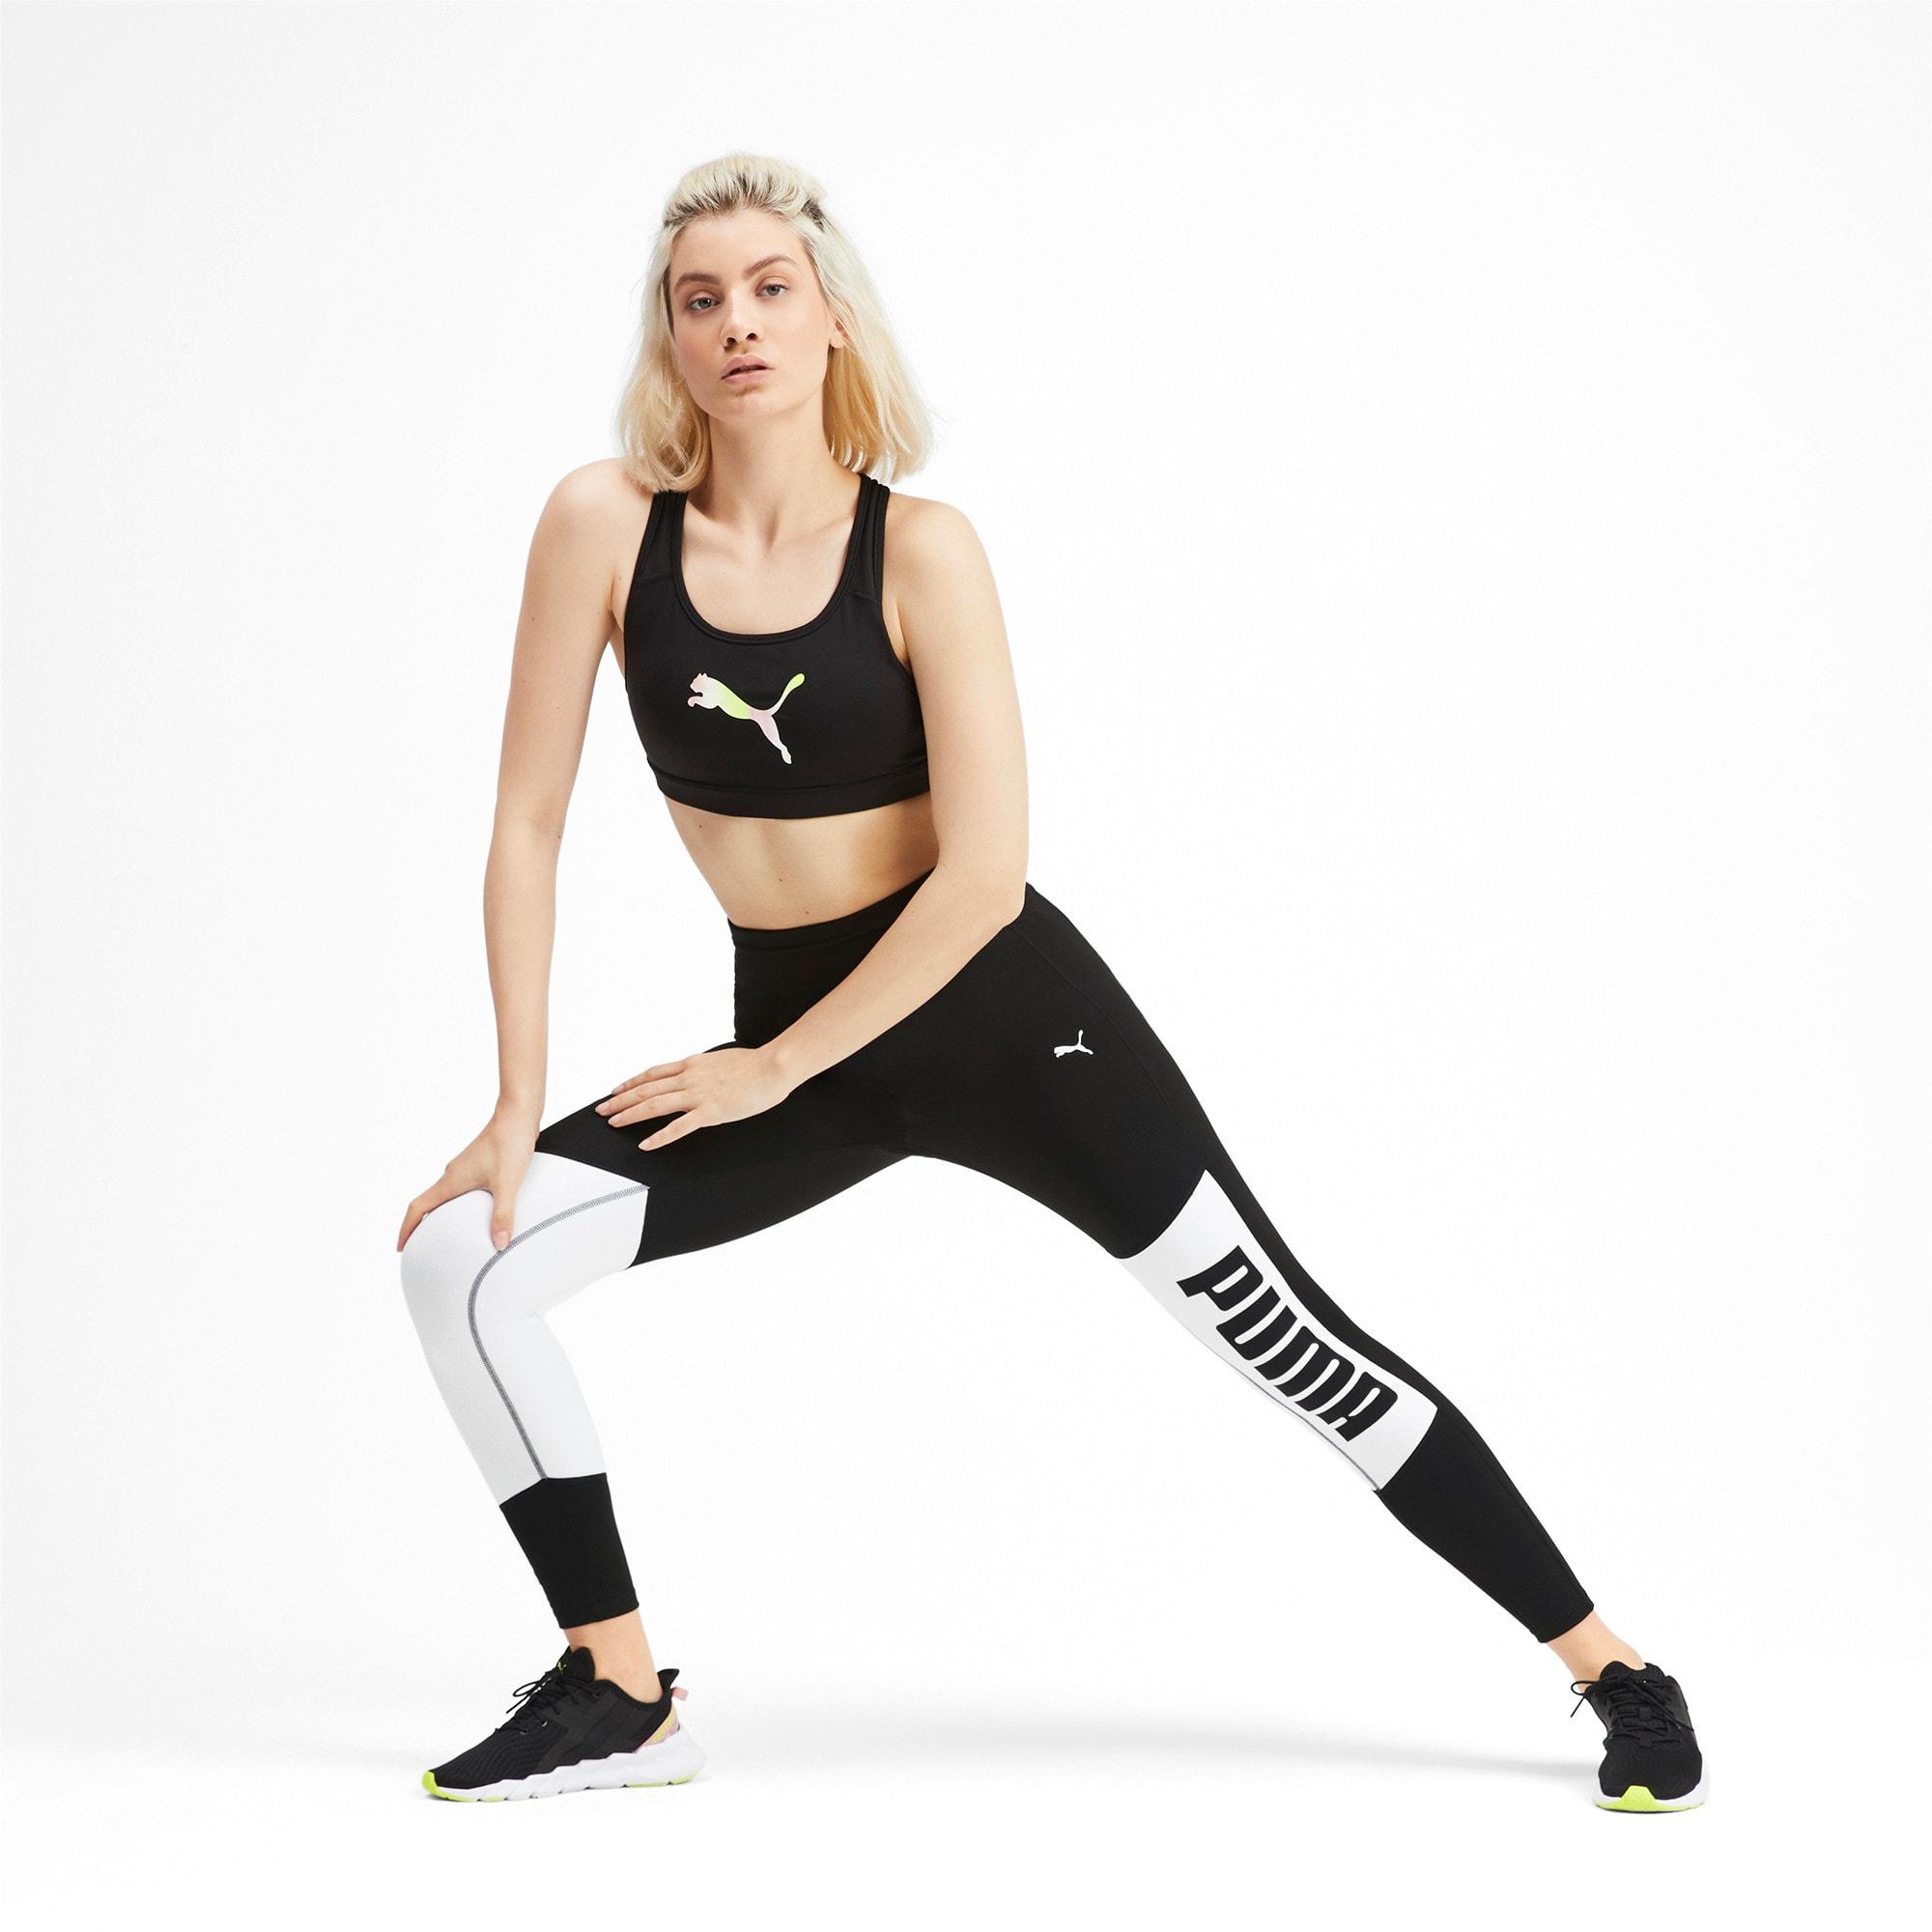 Thumbnail 3 of 7/8-trainingslegging met print en logo voor dames, Puma Black-Puma White, medium